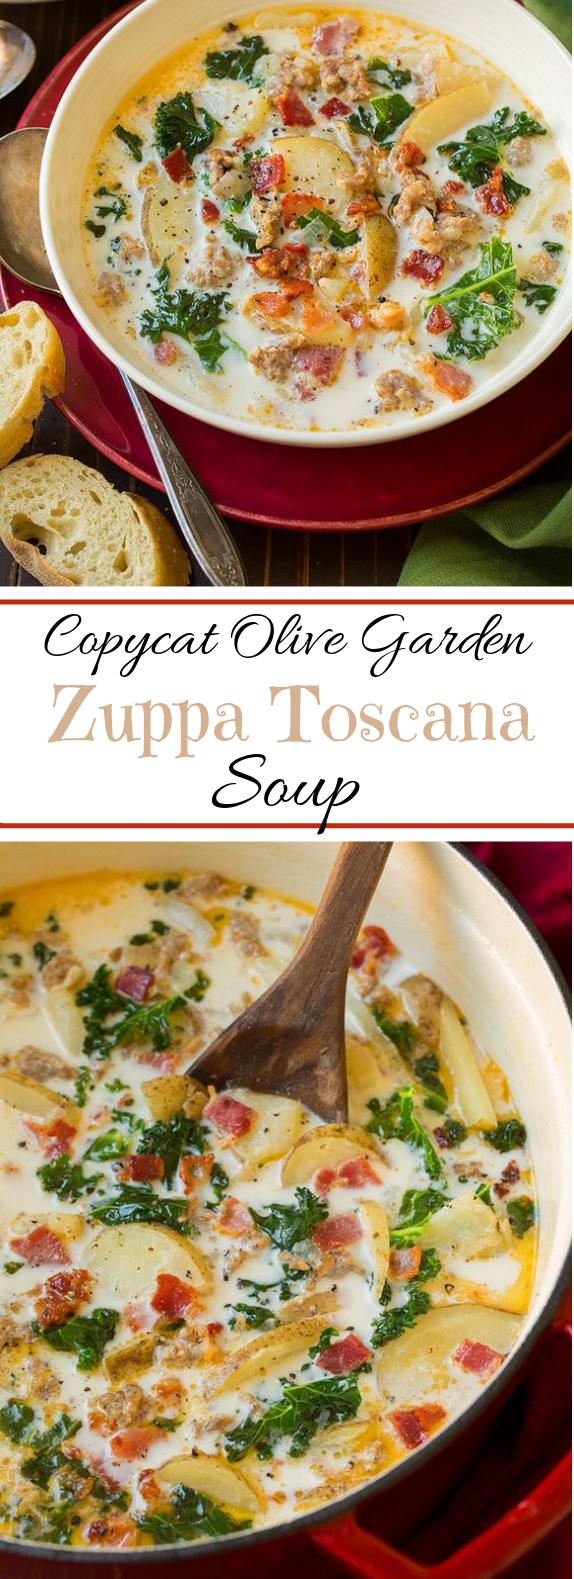 Zuppa Toscana Soup (Olive Garden Copycat) #winterrecipe #soup #zuppatoscanasoup